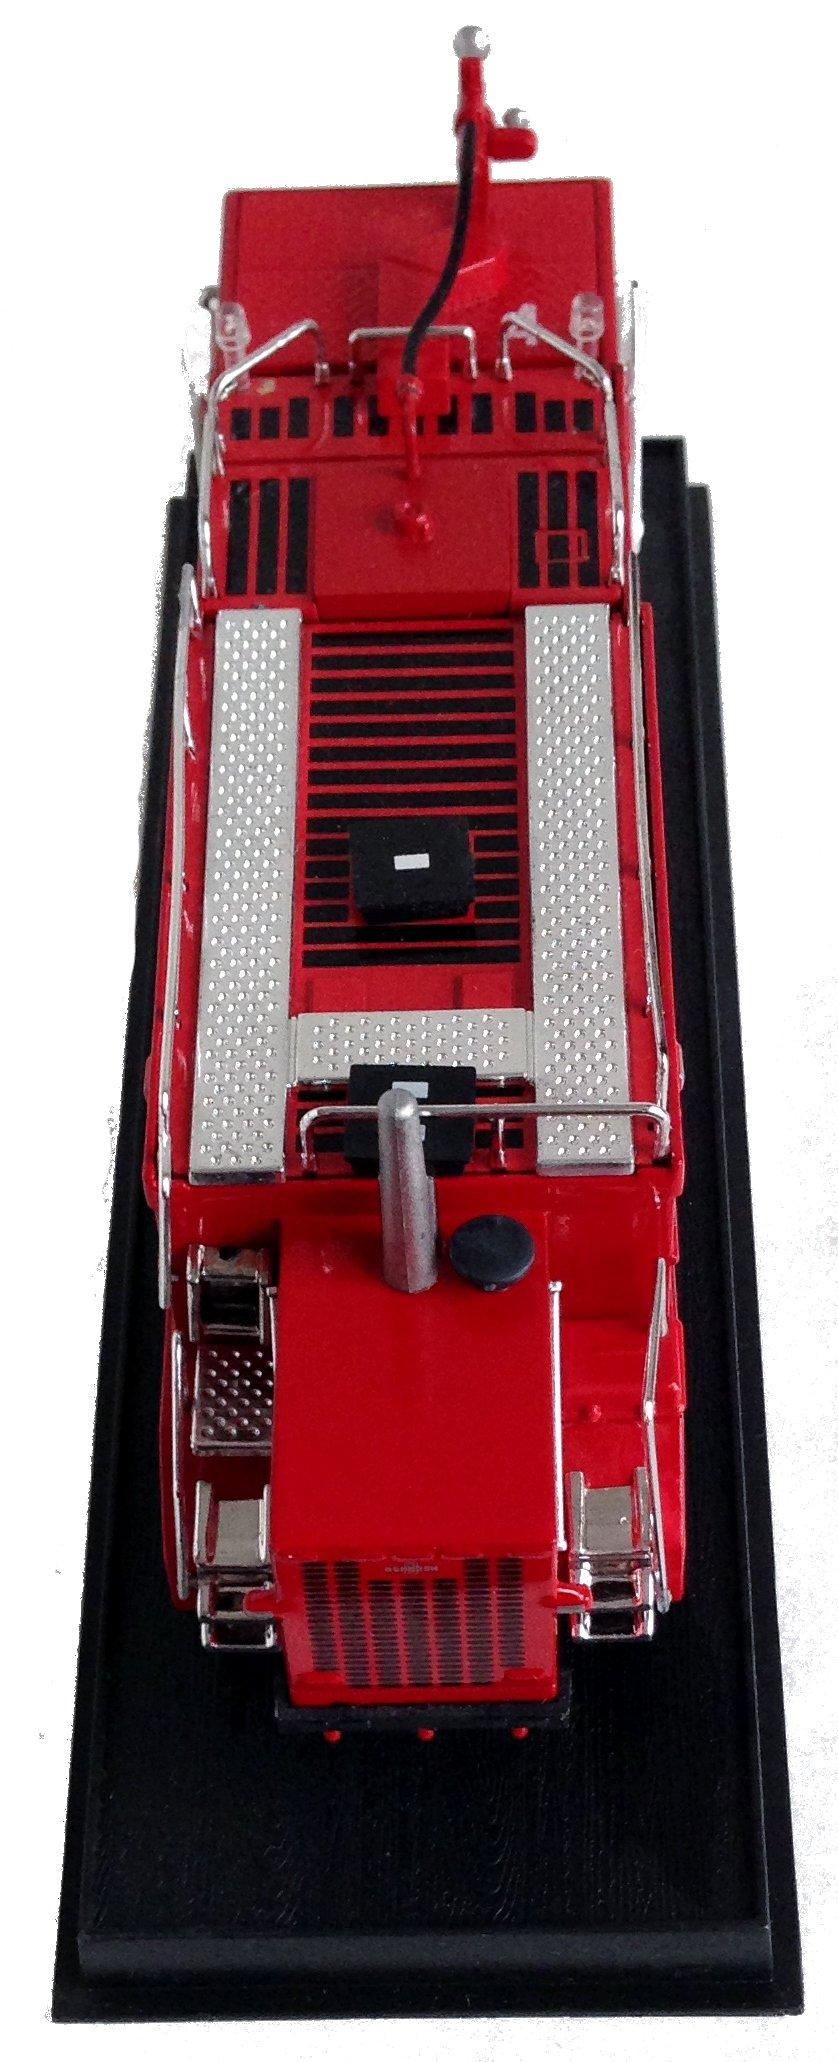 Oshkosh Crash Fire Truck Diecast 1:64 Model Amercom GB-3